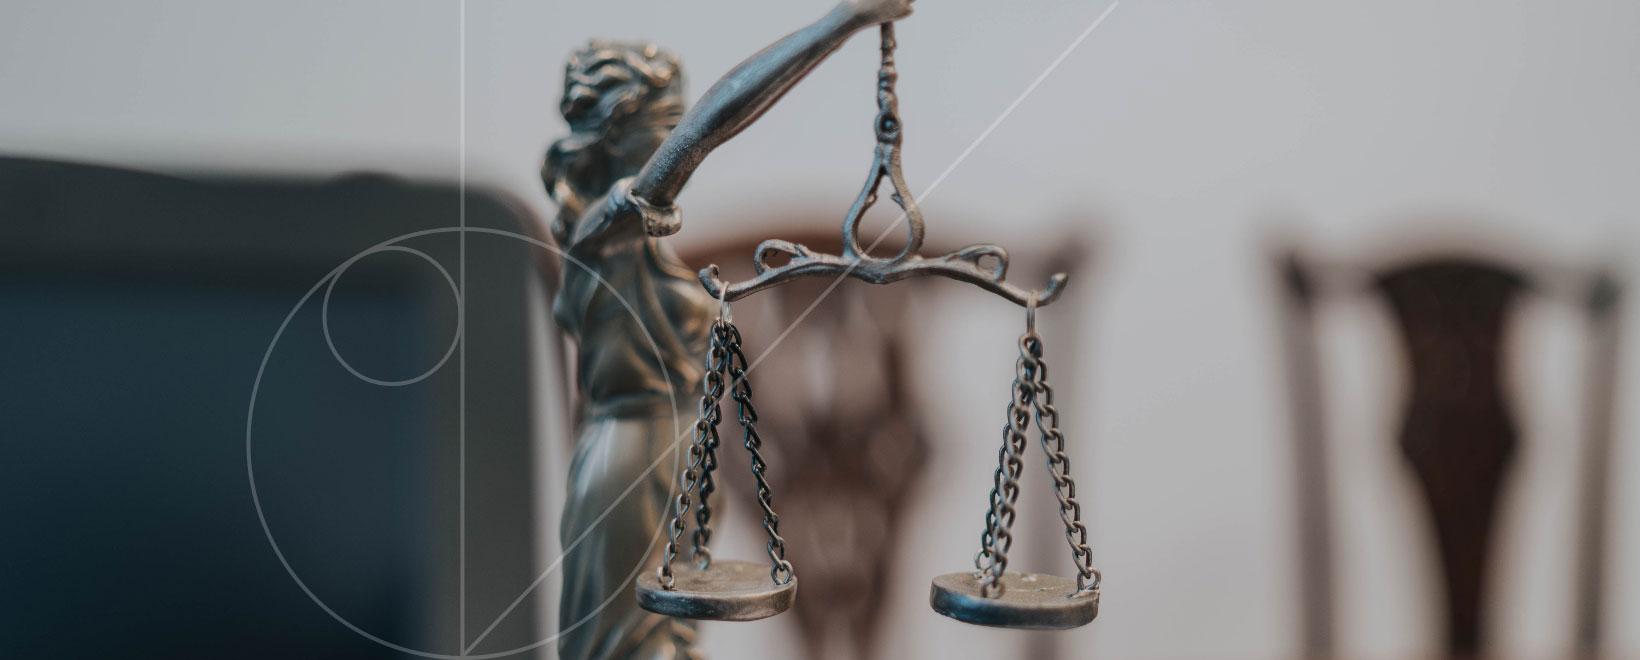 Akty notarialne u notariusza